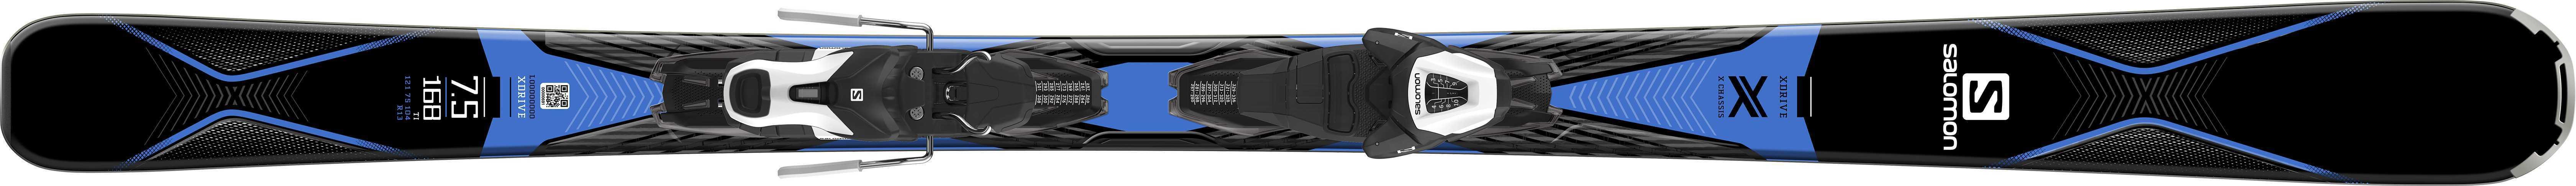 X-DRIVE 7.5